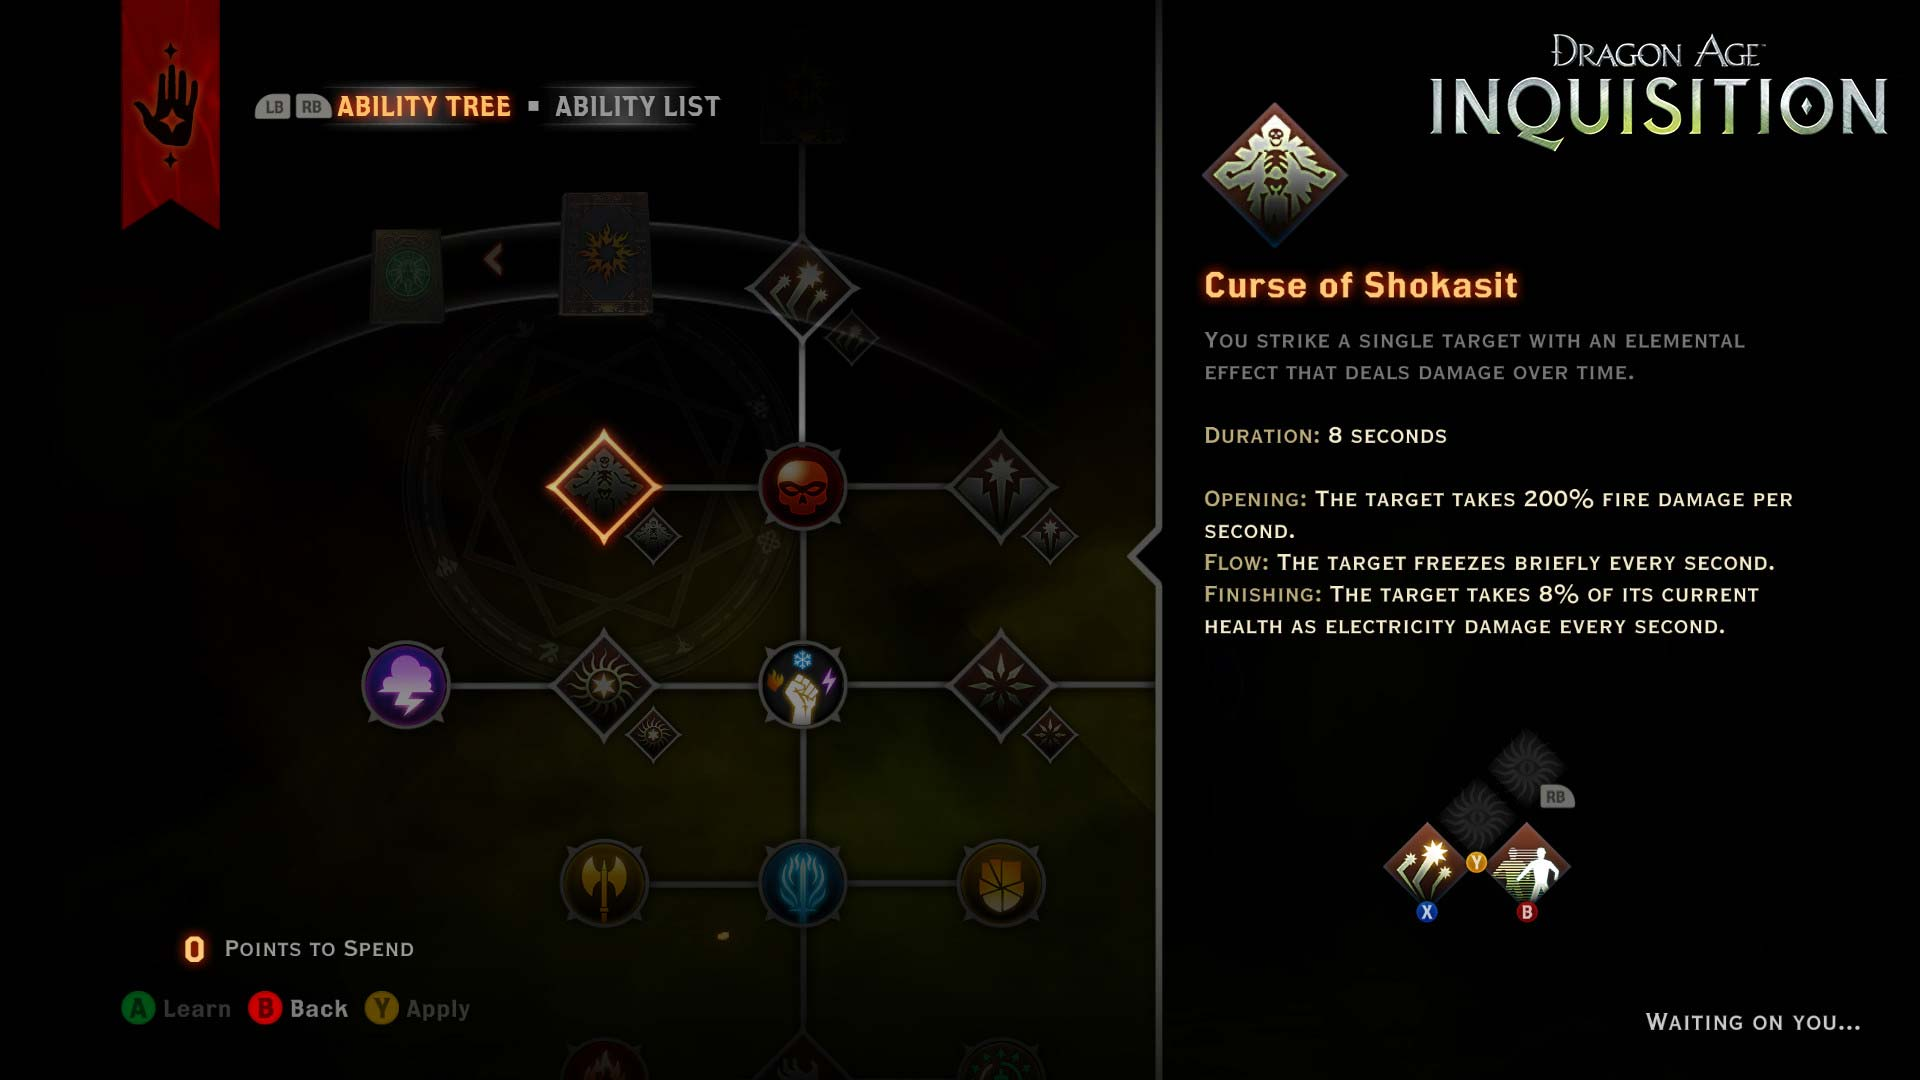 Dragon Age: Inquisition Updates